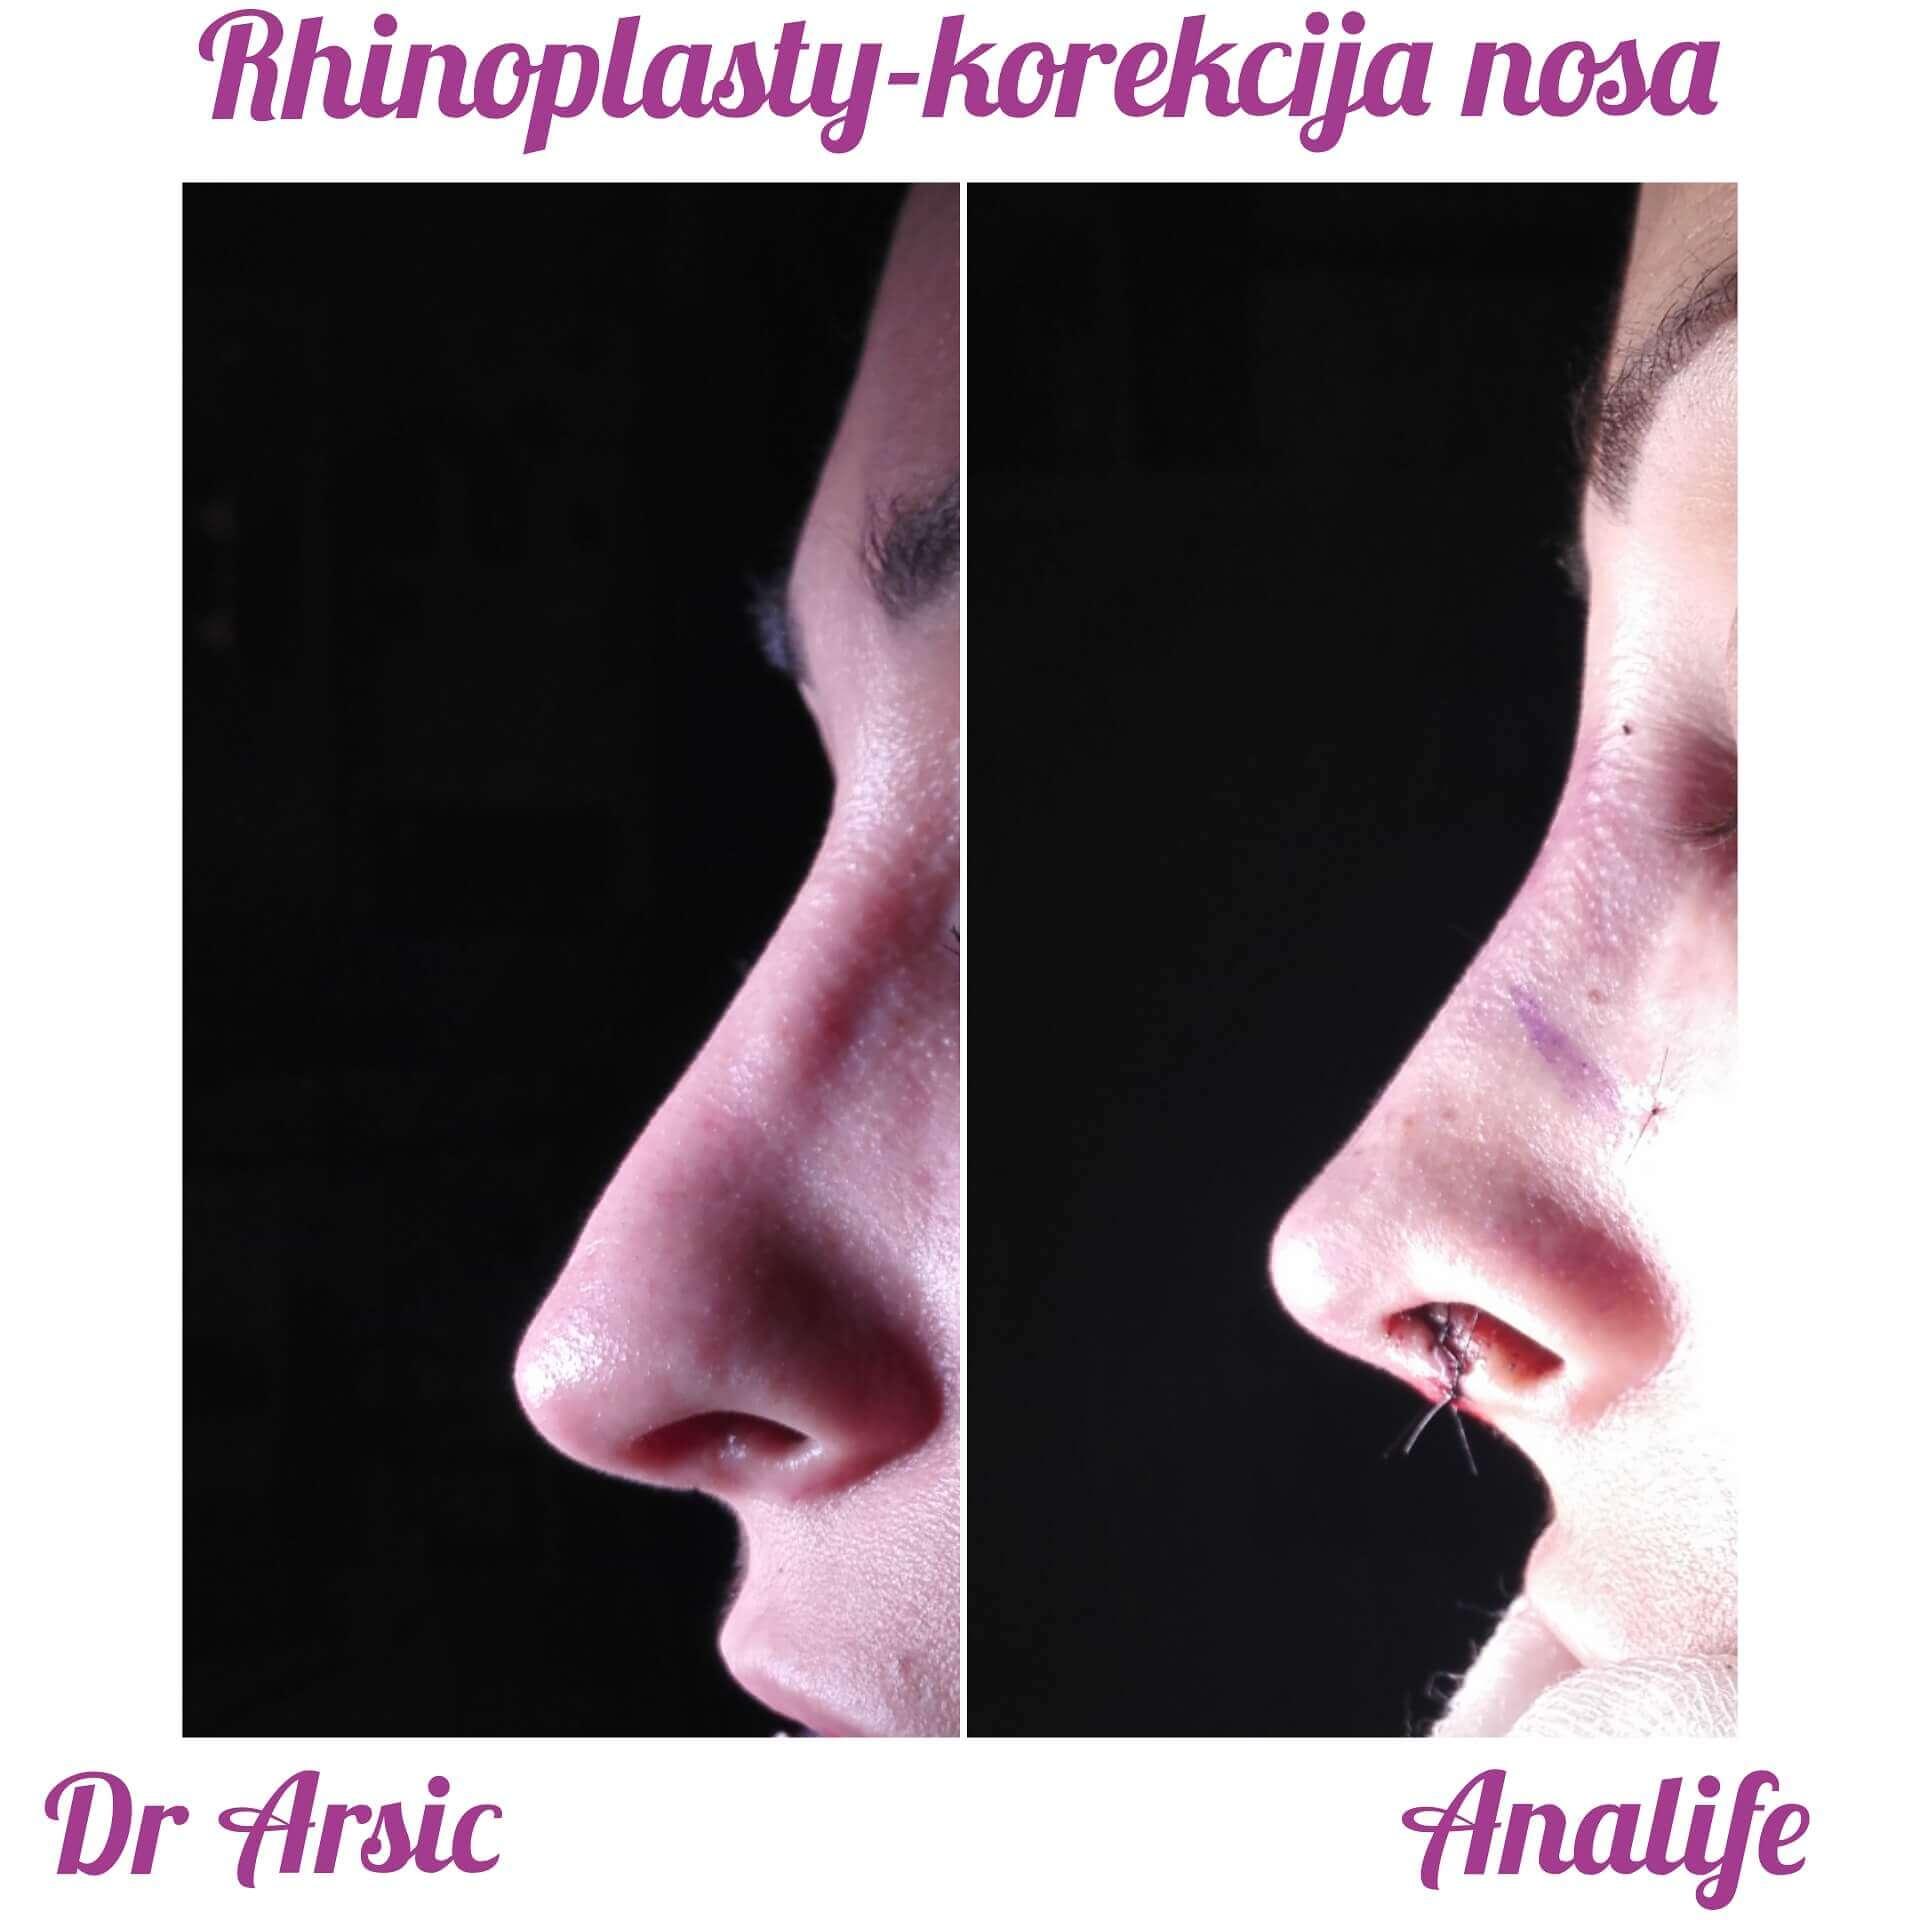 Rinoplastika - korekcija nosa